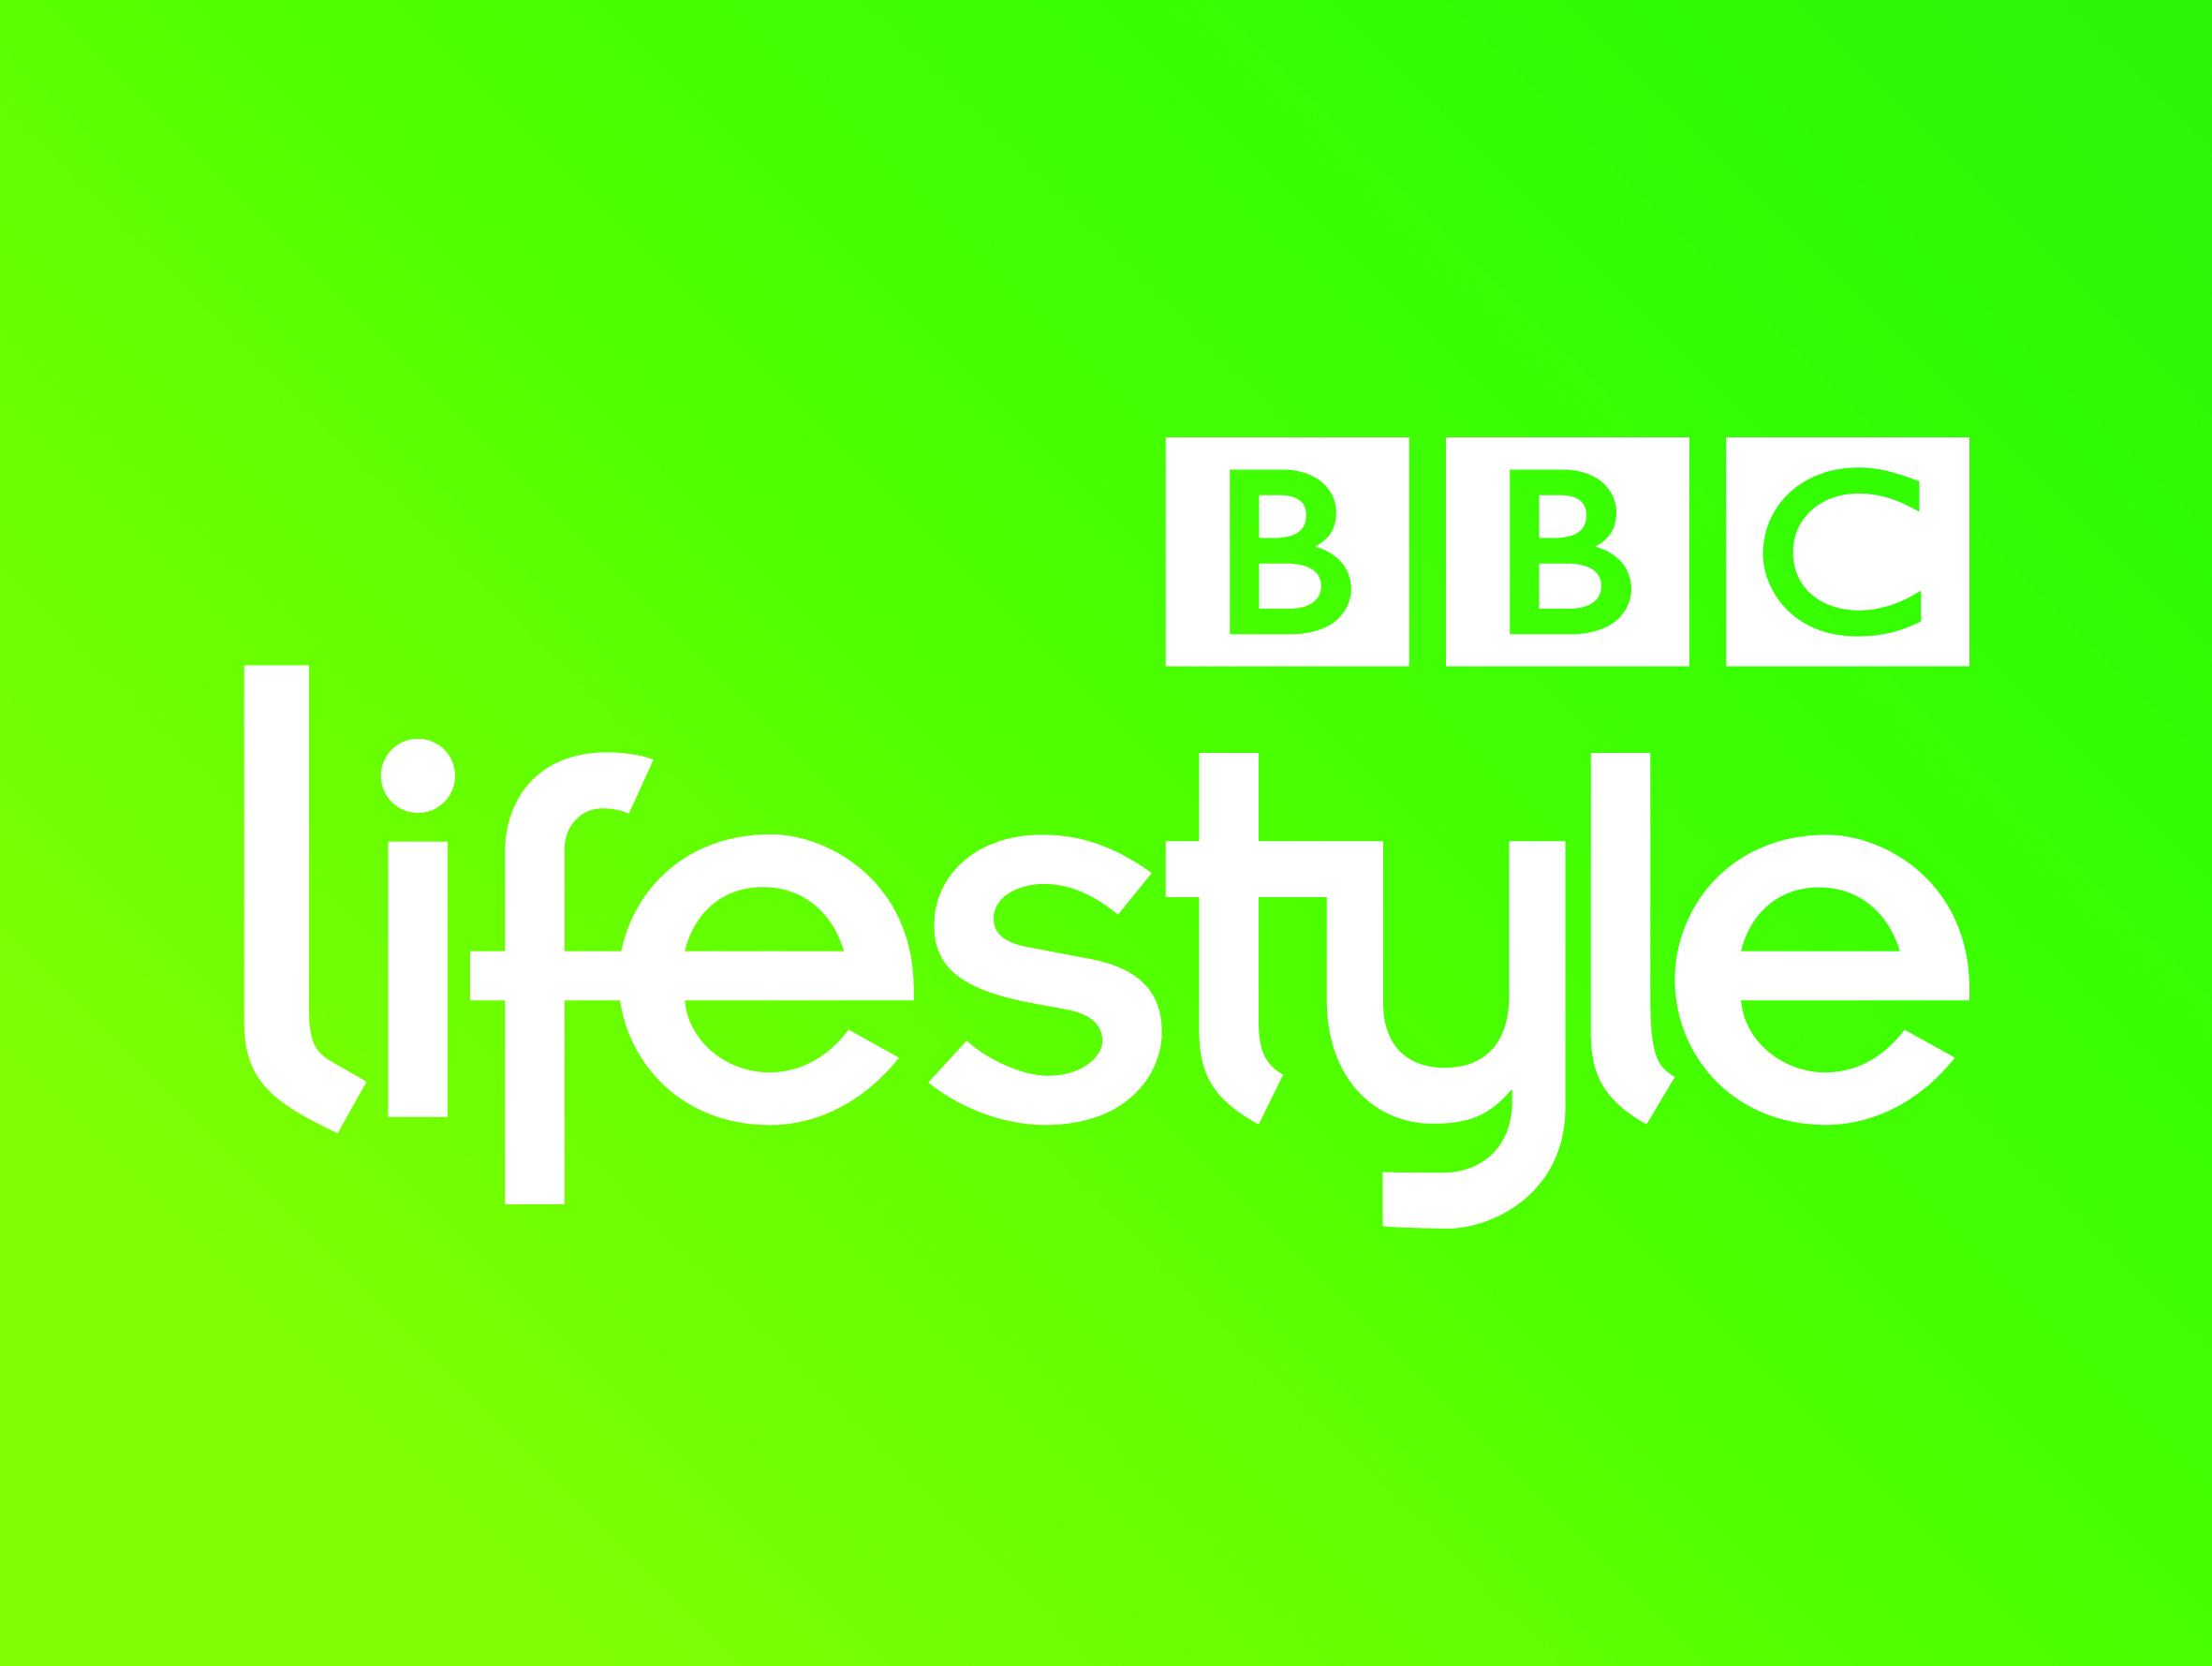 BBC Lifestyle HD